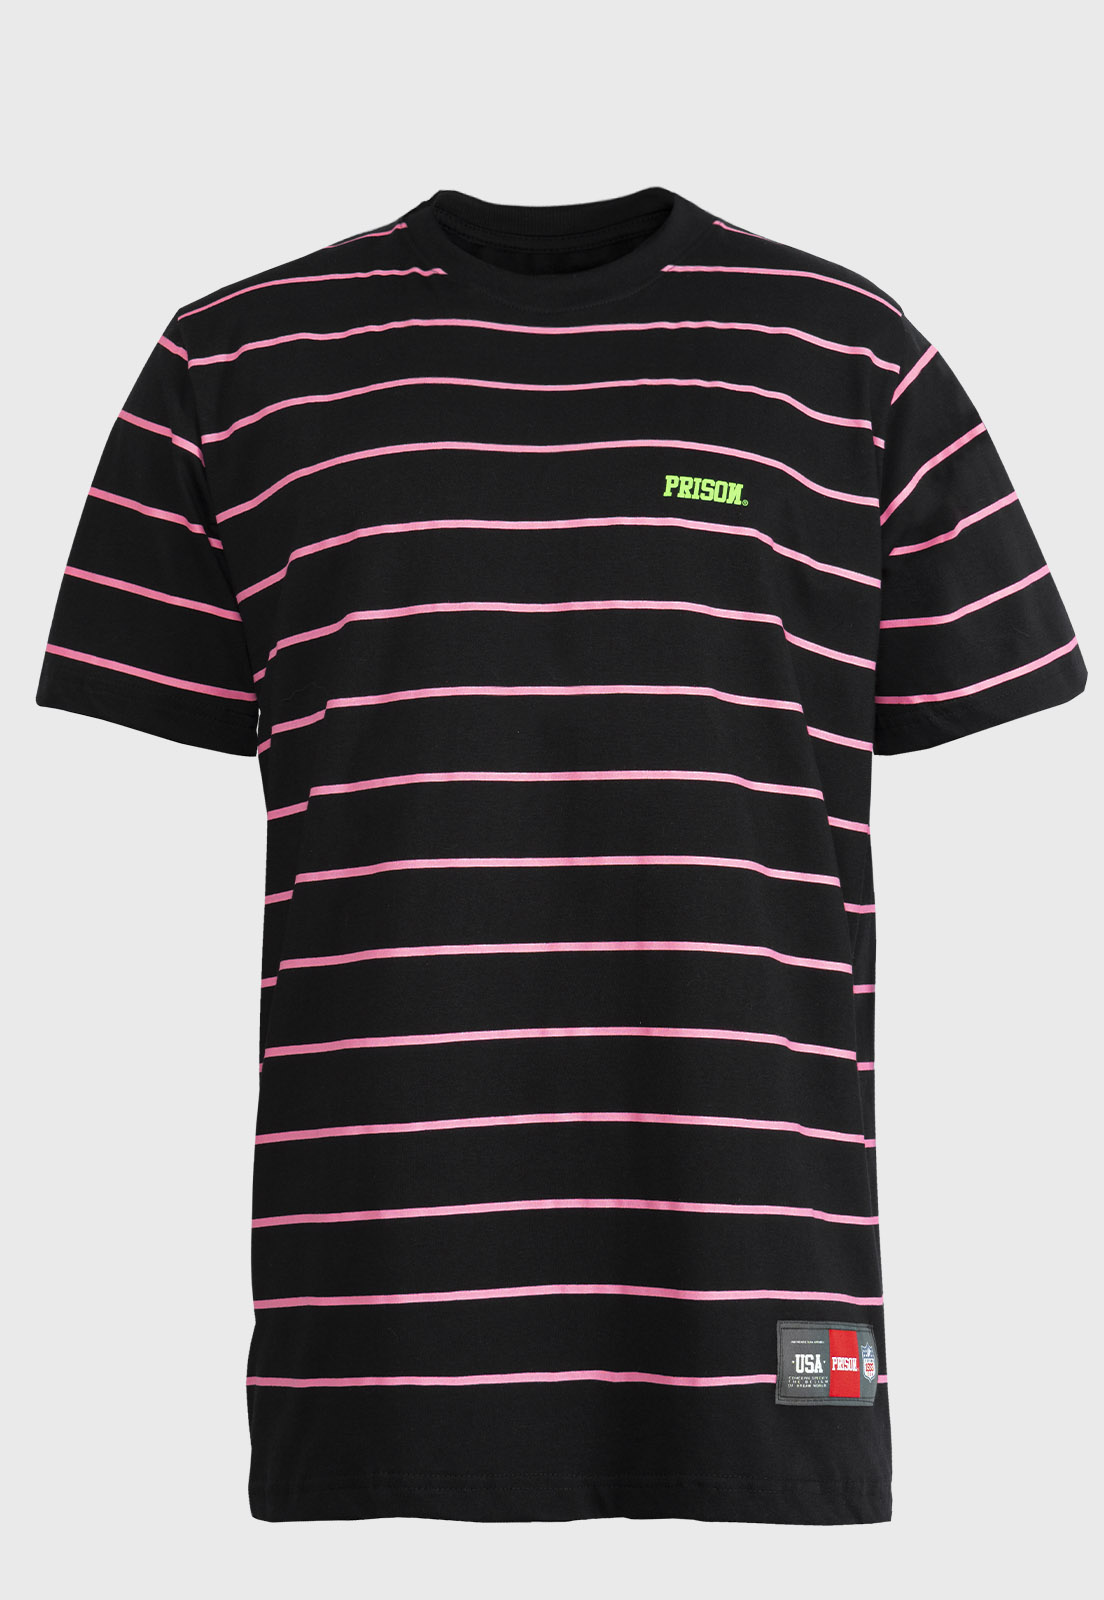 Camiseta Listrada rosa Prison logo Green